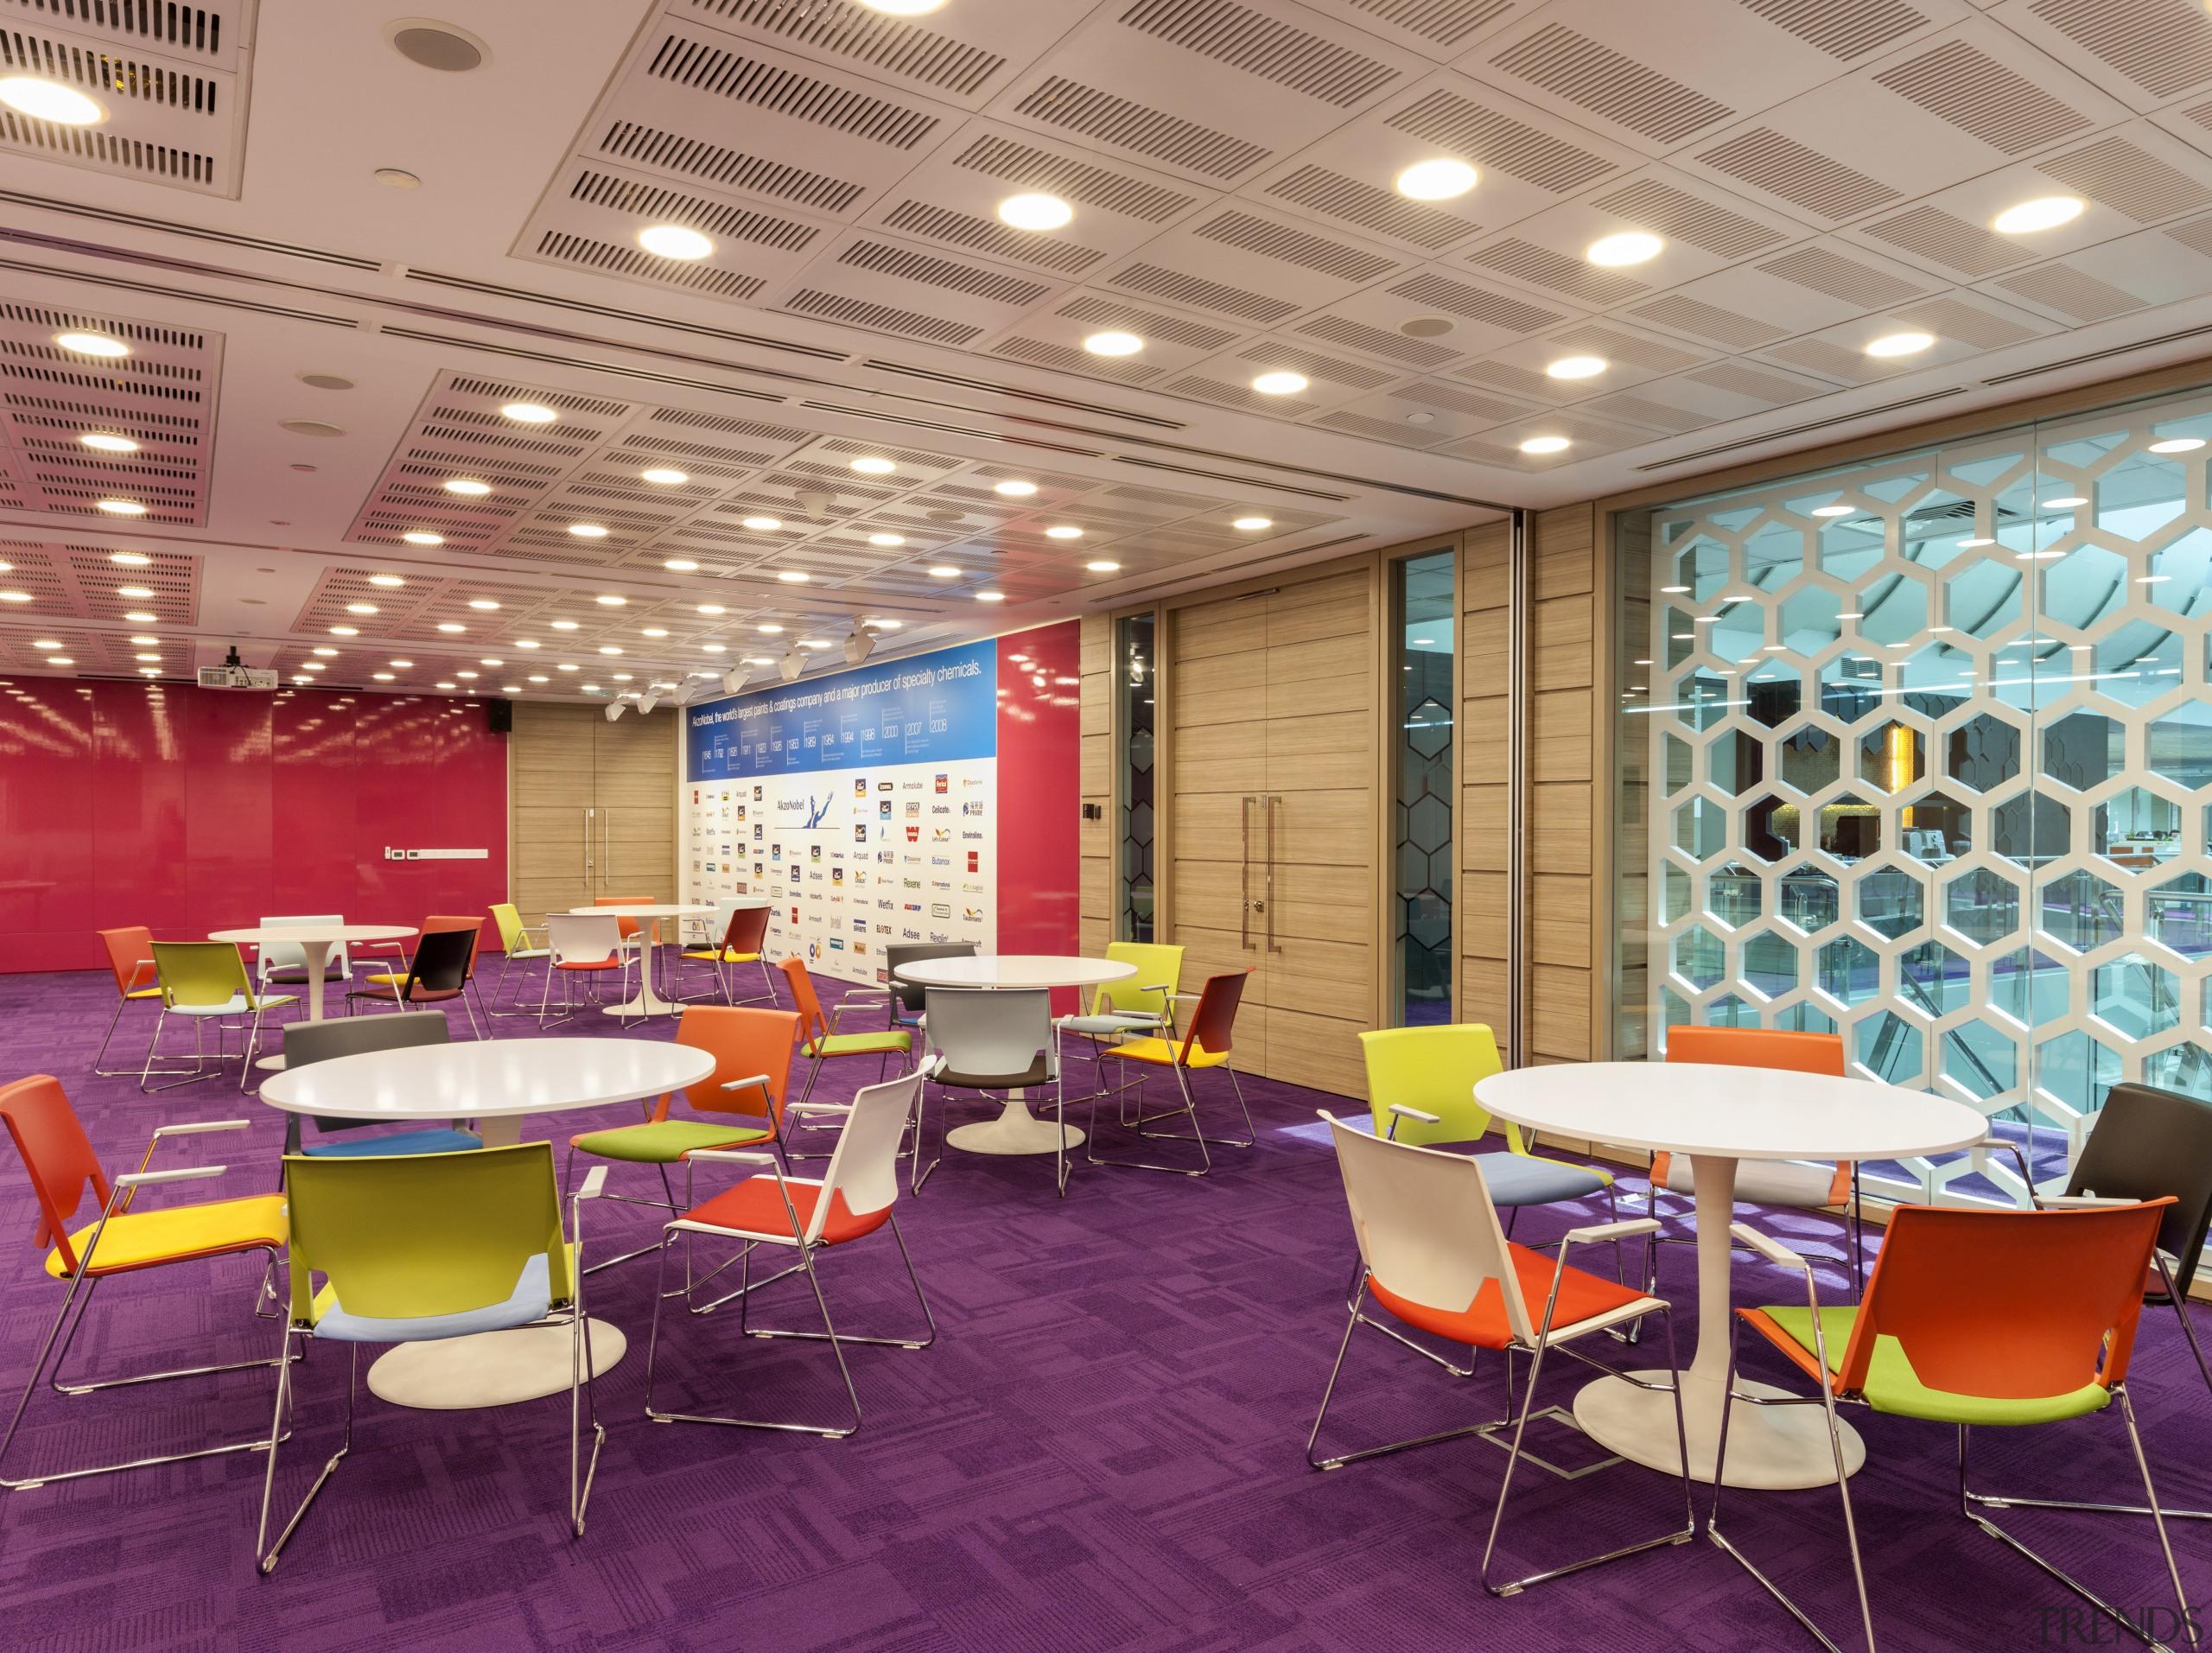 AkzoNobel House (Singapore) Interior design - AkzoNobel House cafeteria, ceiling, conference hall, function hall, furniture, interior design, lobby, office, table, orange